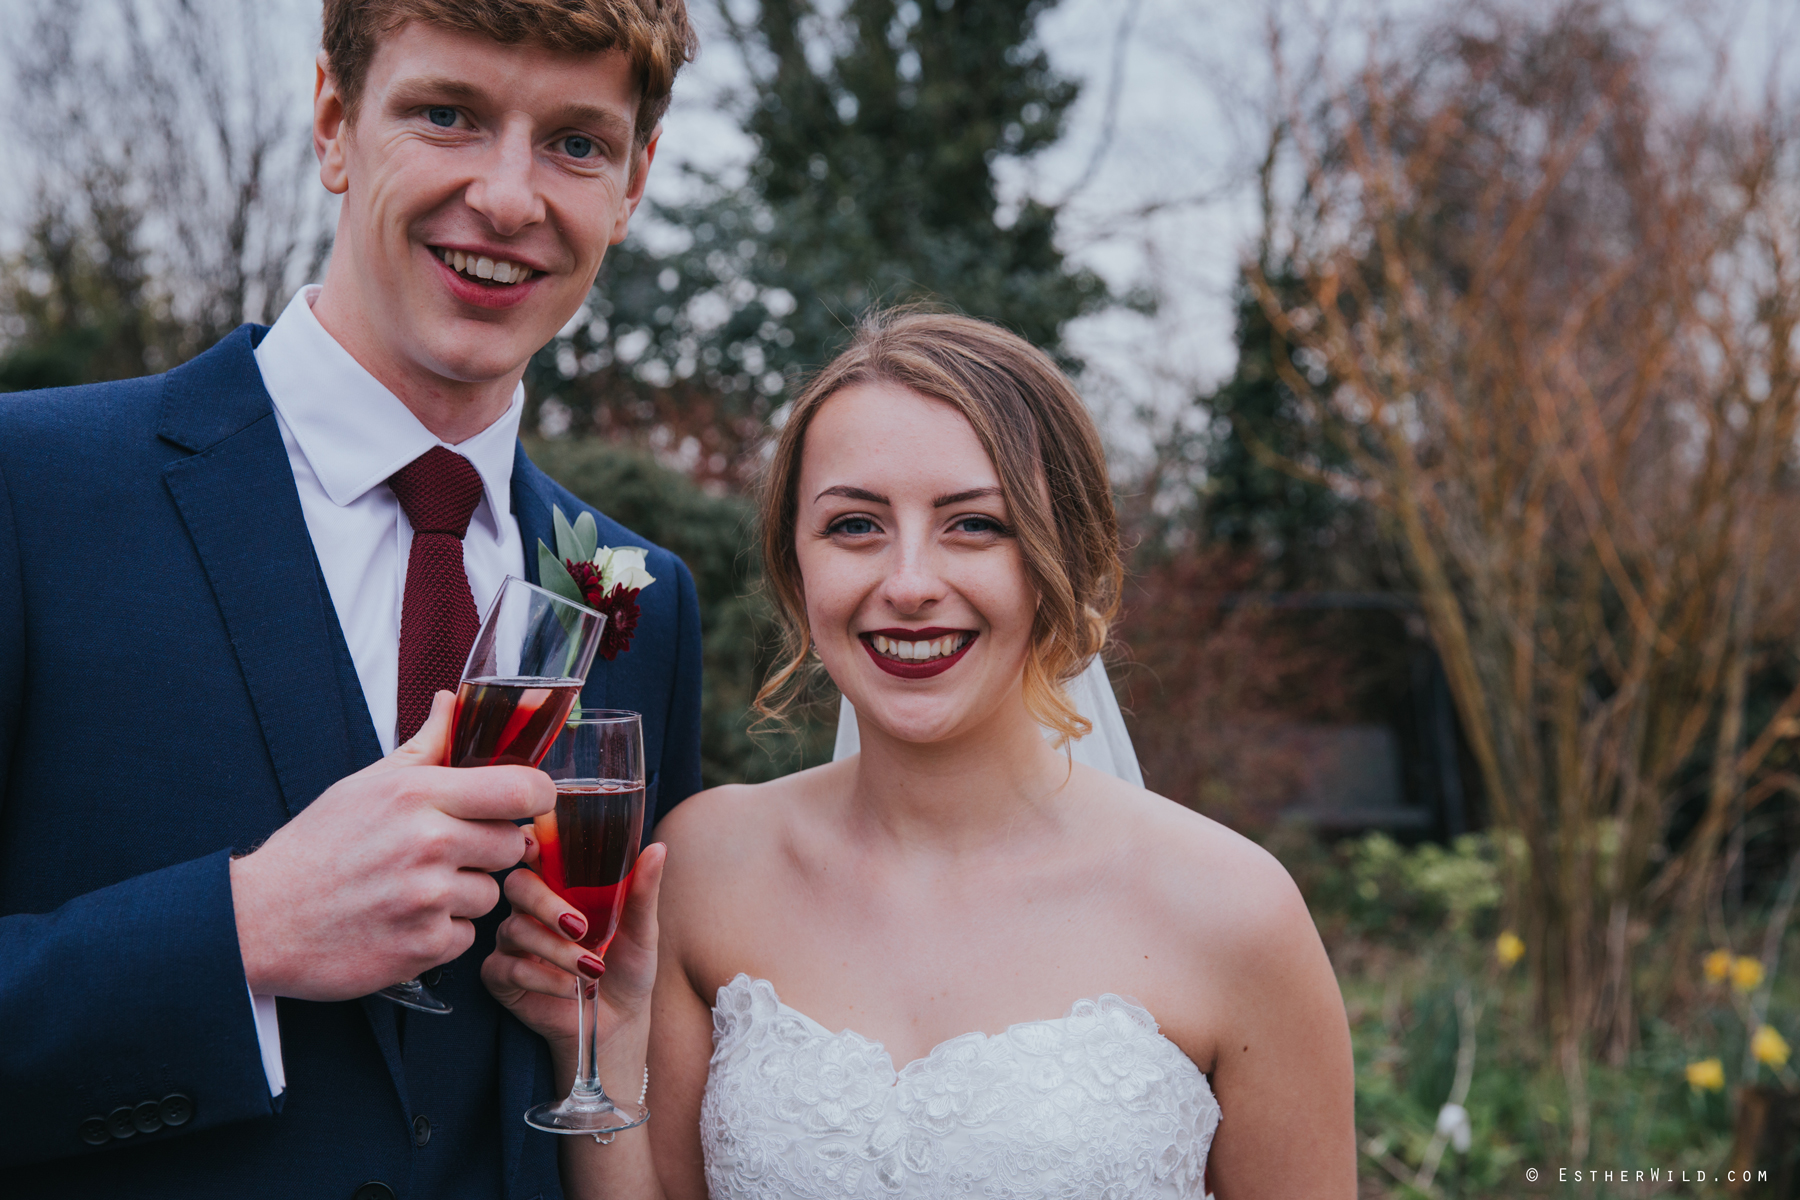 Glebe_Farm_Barn_Rustic_Norfolk_Wedding_Esther_Wild_Photographer_Copyright_IMG_2080.jpg